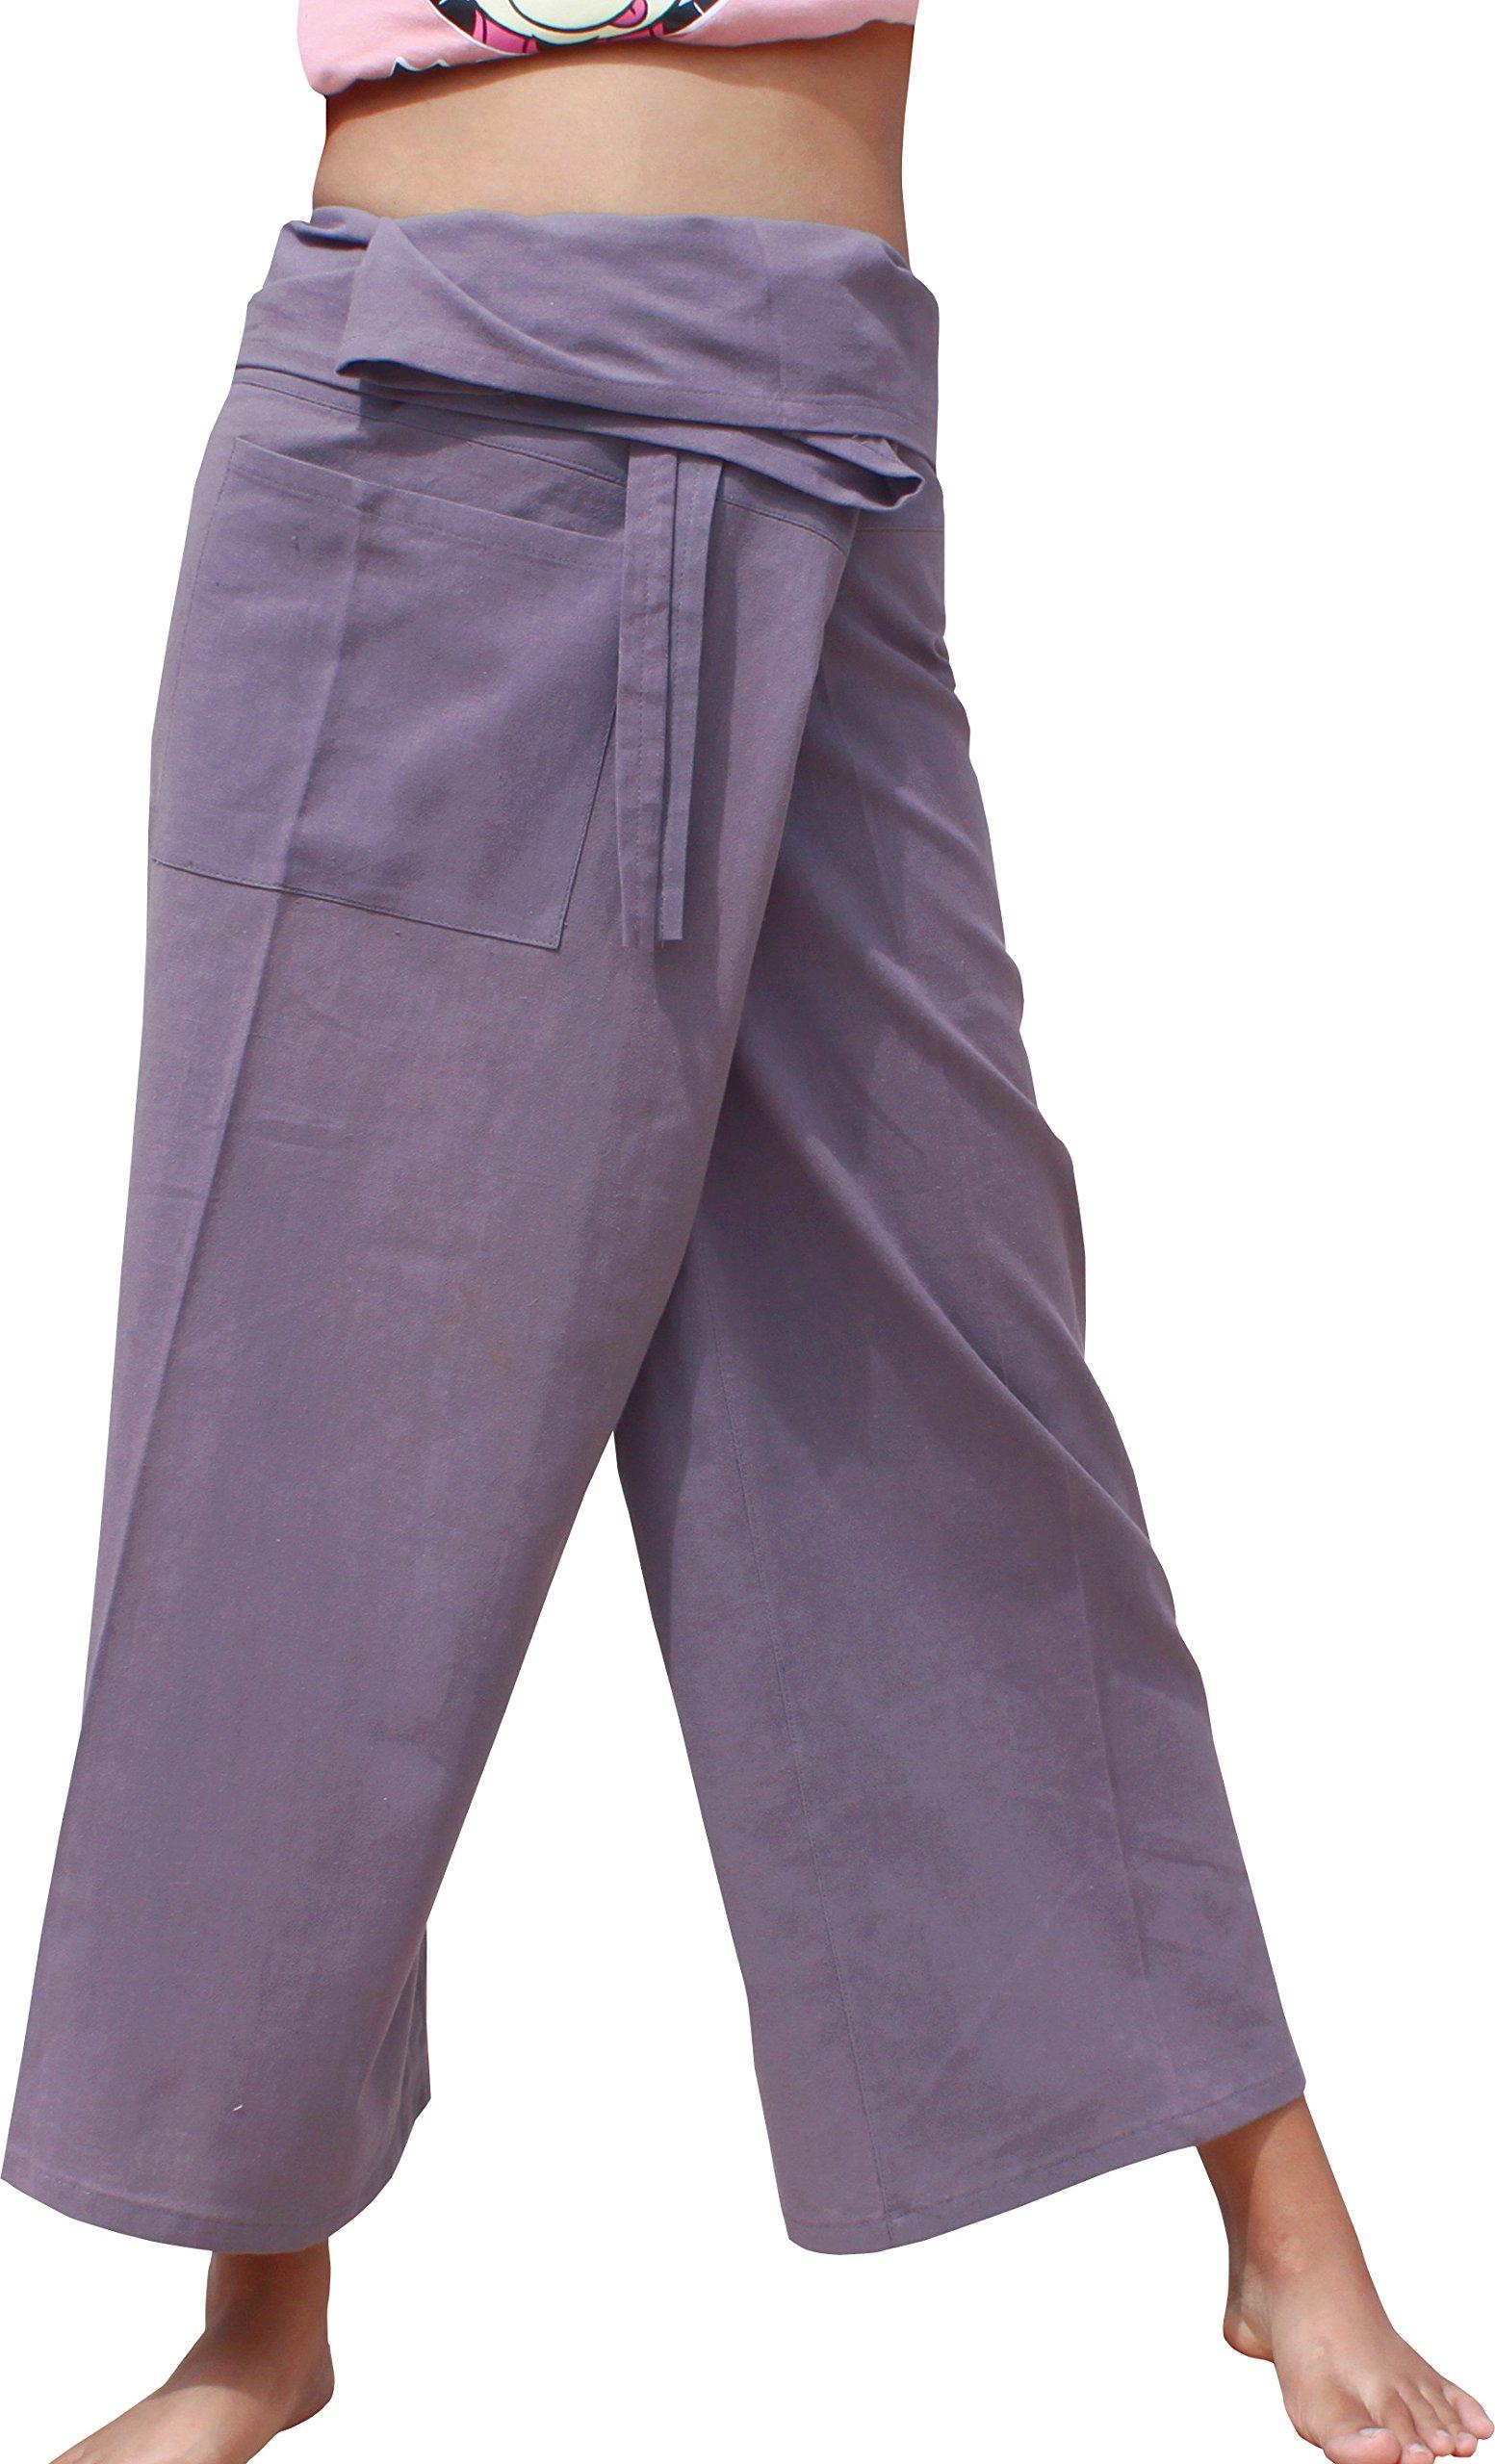 Raan Pah Muang RaanPahMuang Brand Light Summer Cotton Thai Plain Fisherman Wrap Pants Tall Cut, Medium, Cool Gray by Raan Pah Muang